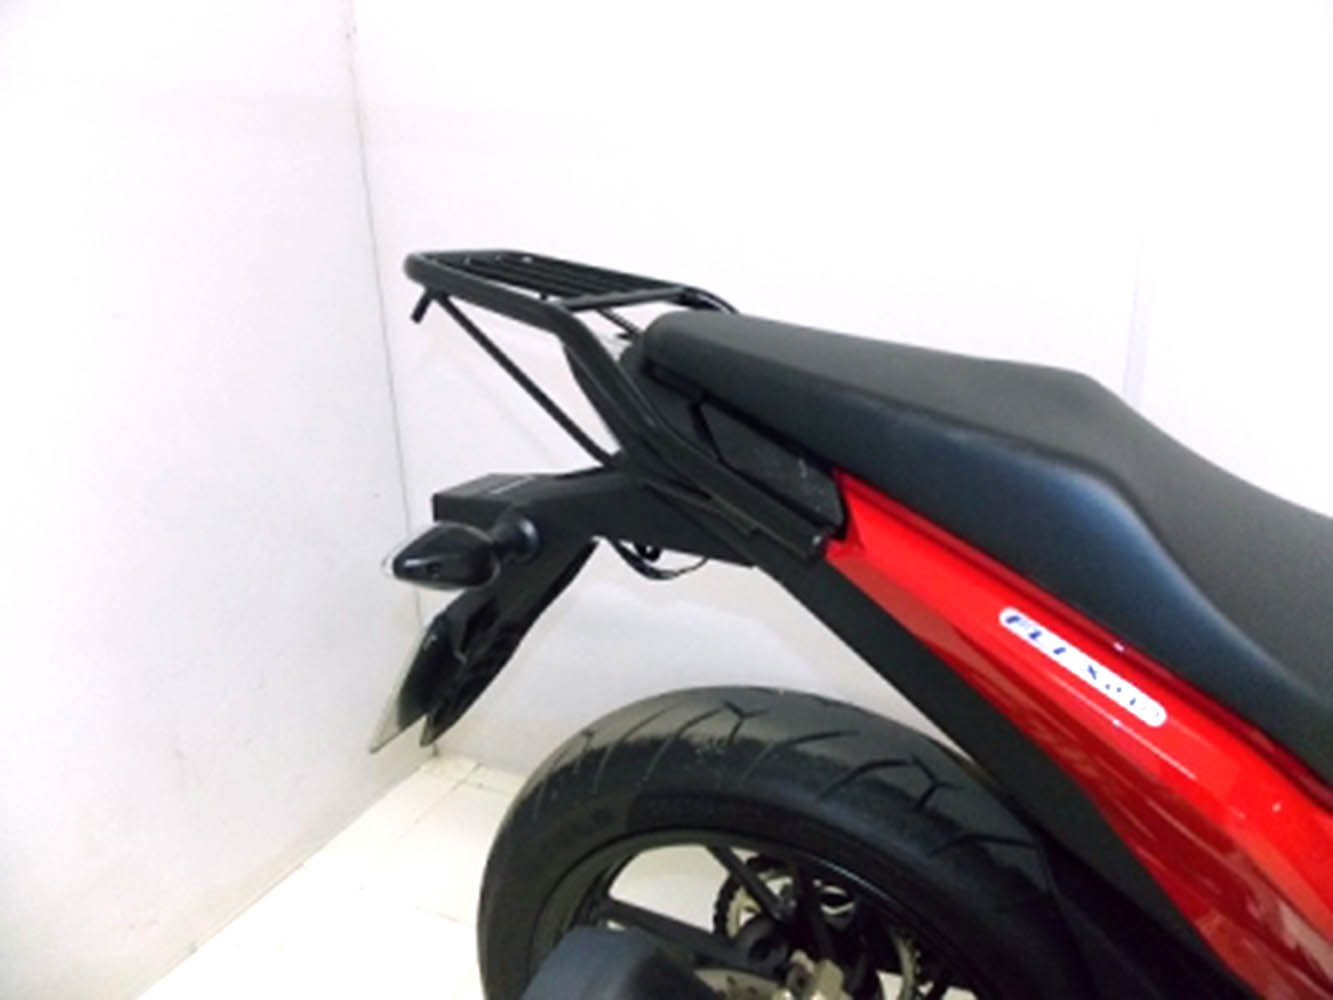 Bagageiro Tubular Cb 250 Twister Nova 2016 Preto Chapam10066